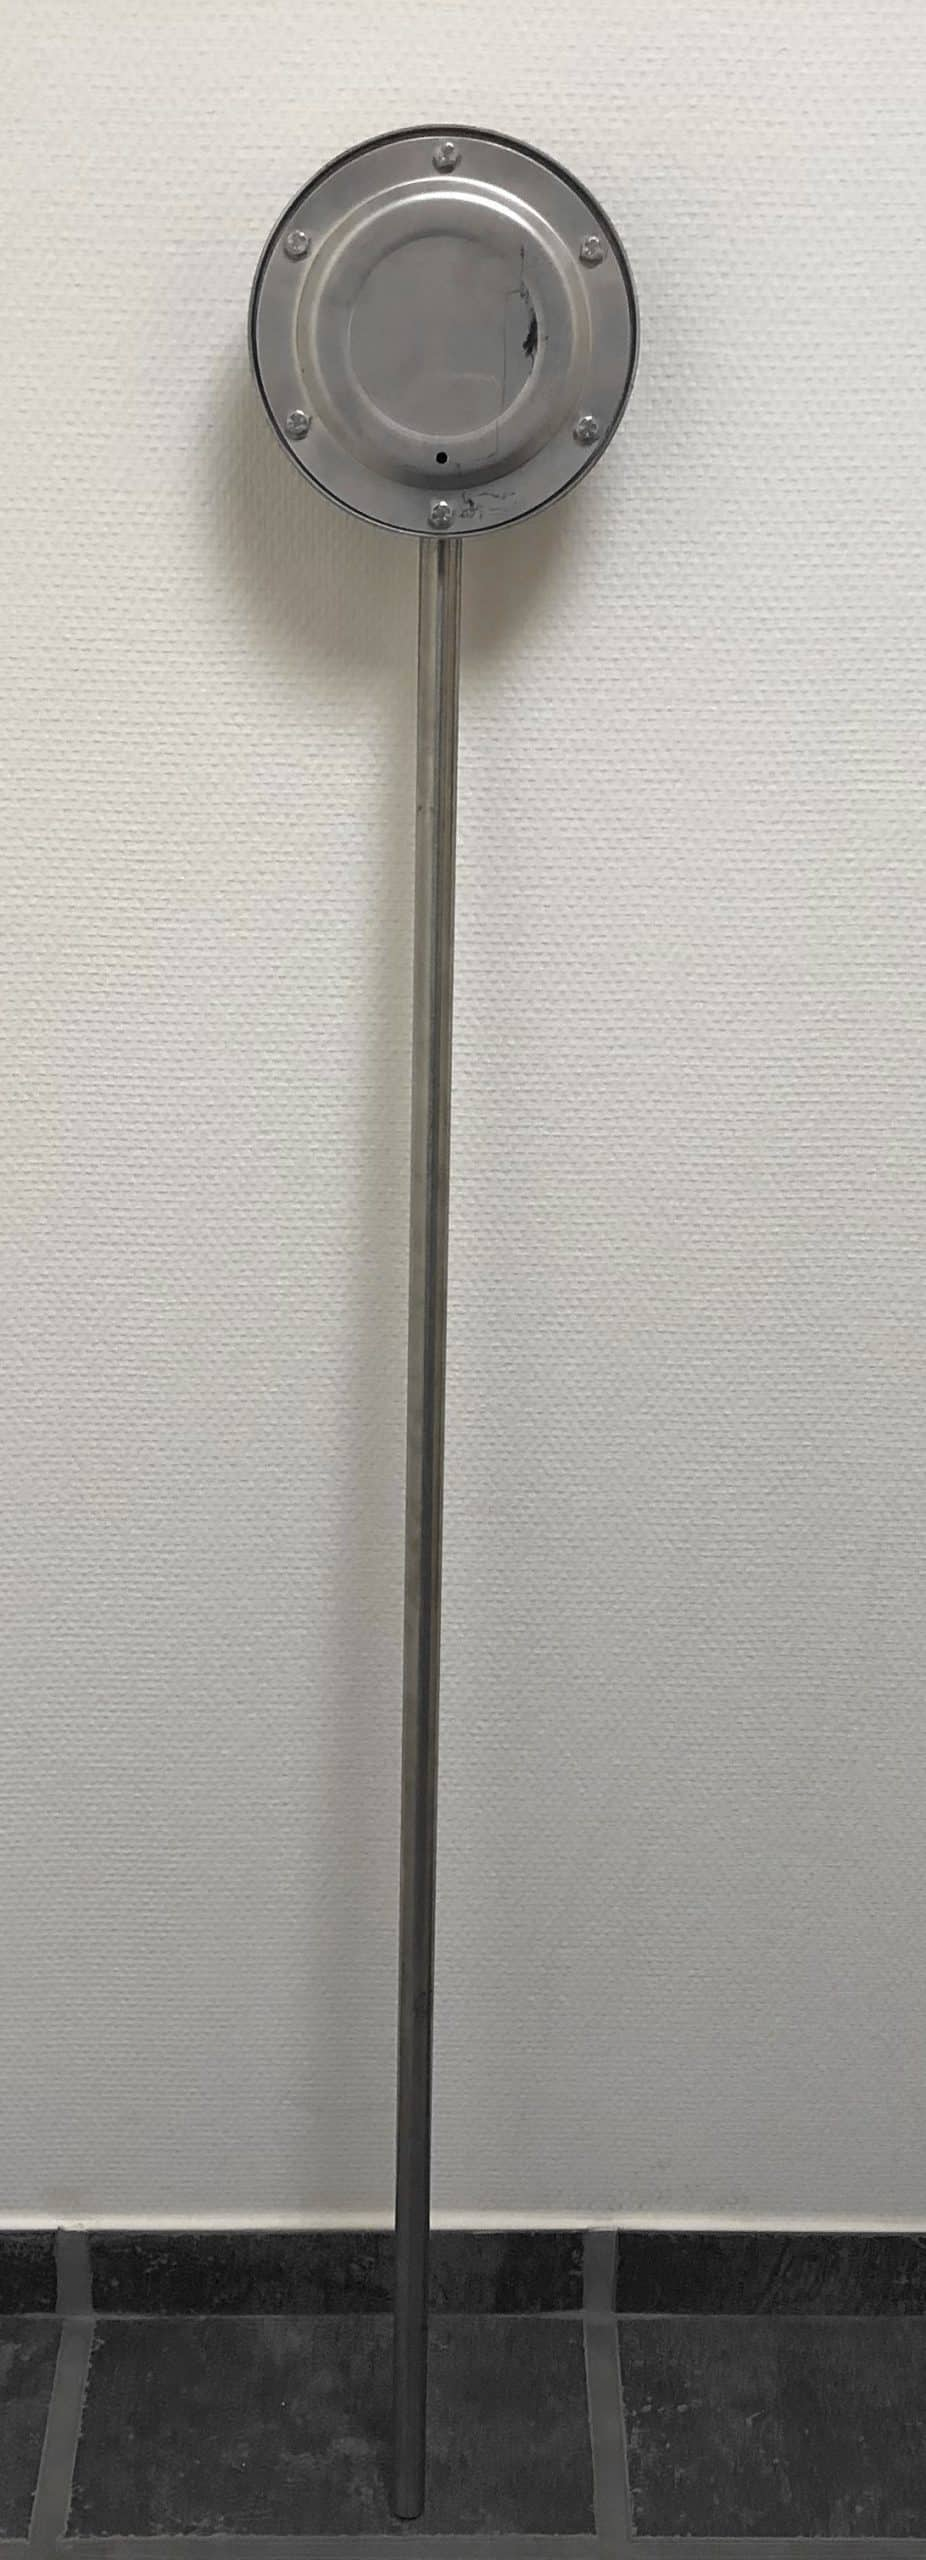 Aqua-Flow rustfri stål, 120 cm.